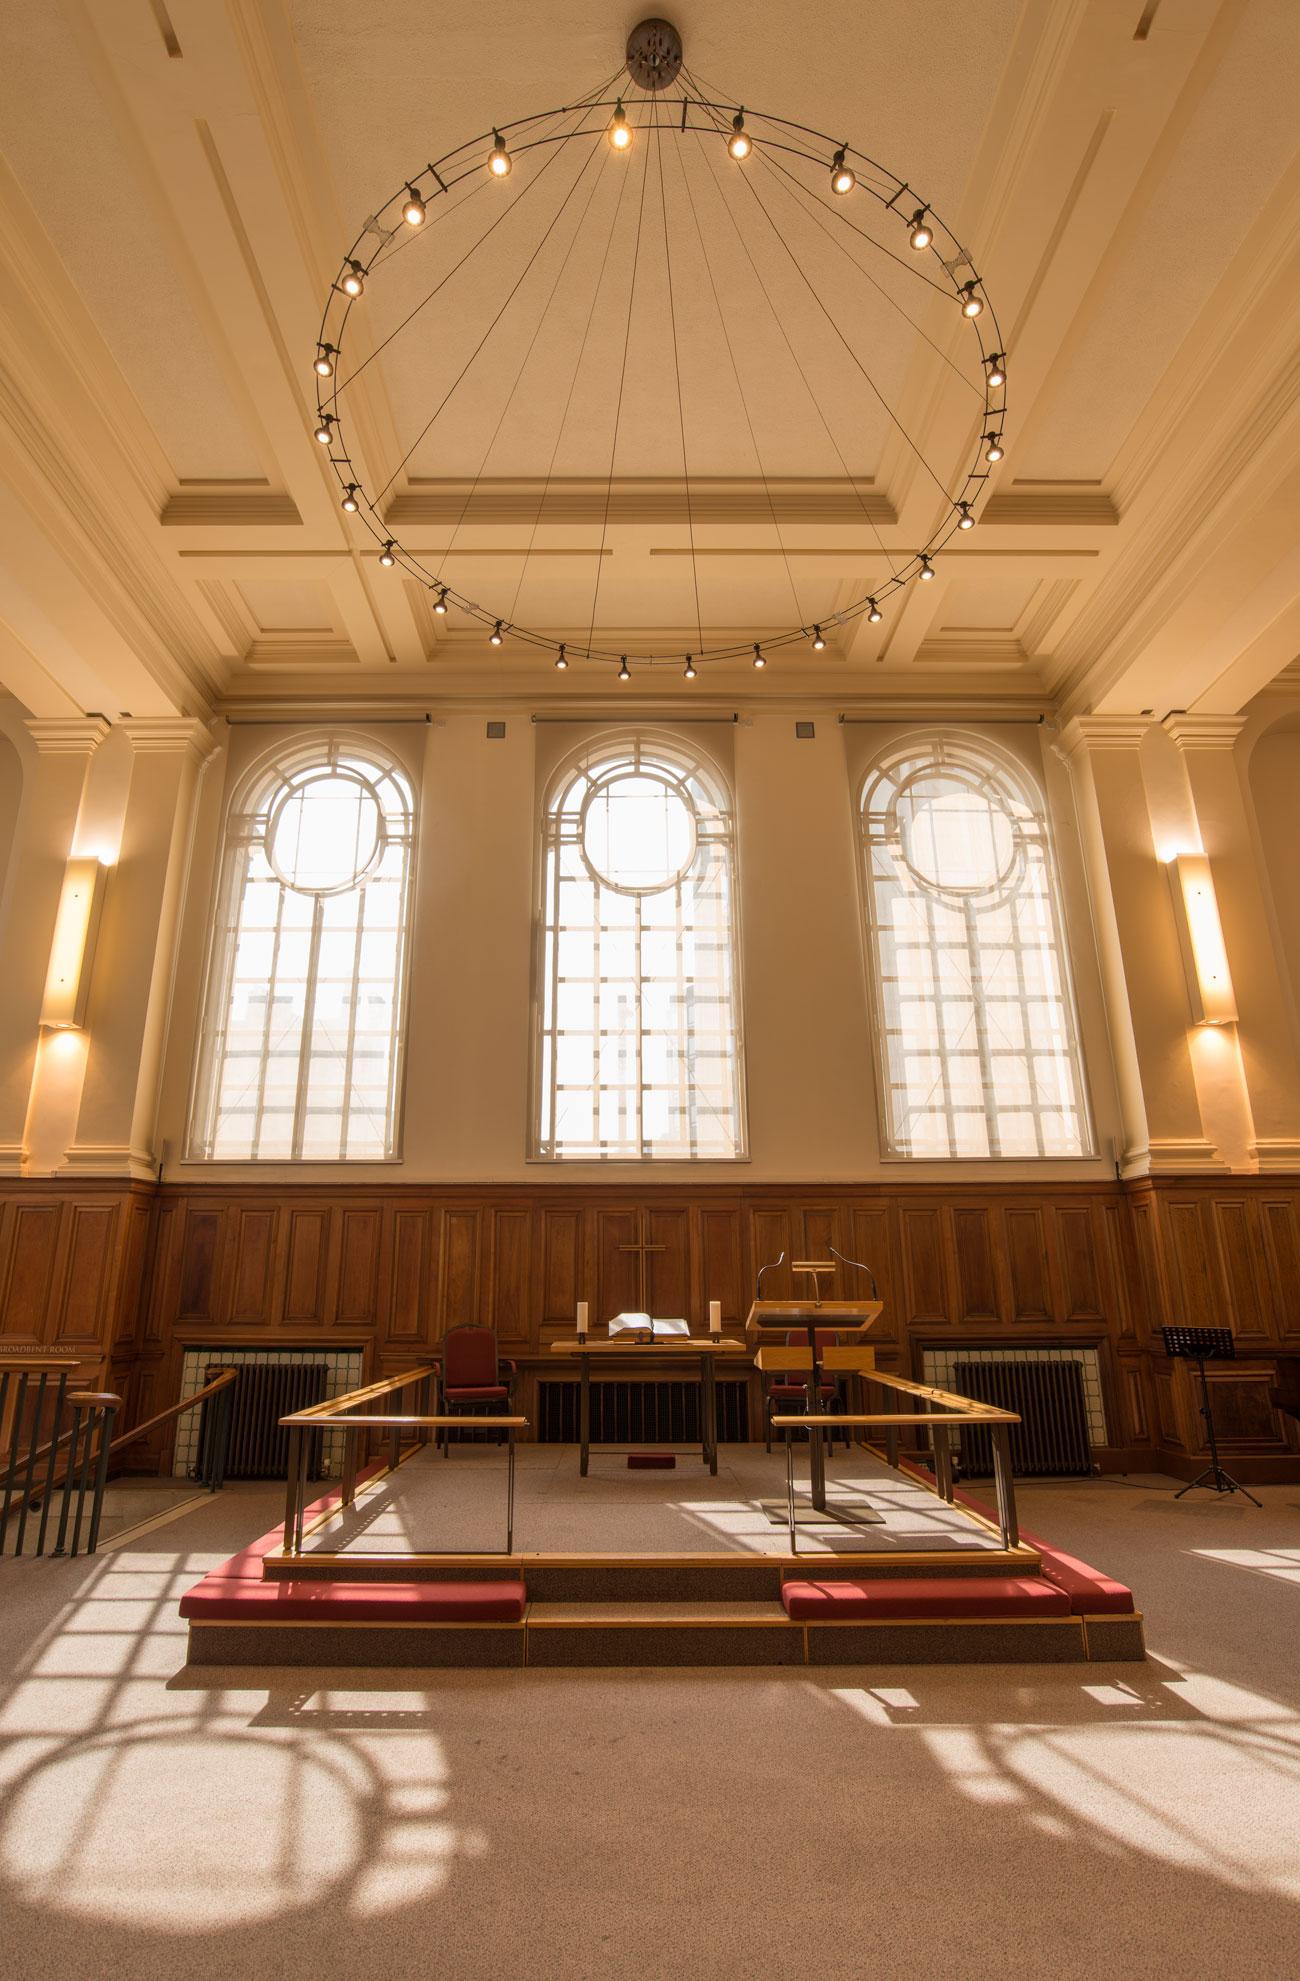 ablett-architects-Central-Hall5